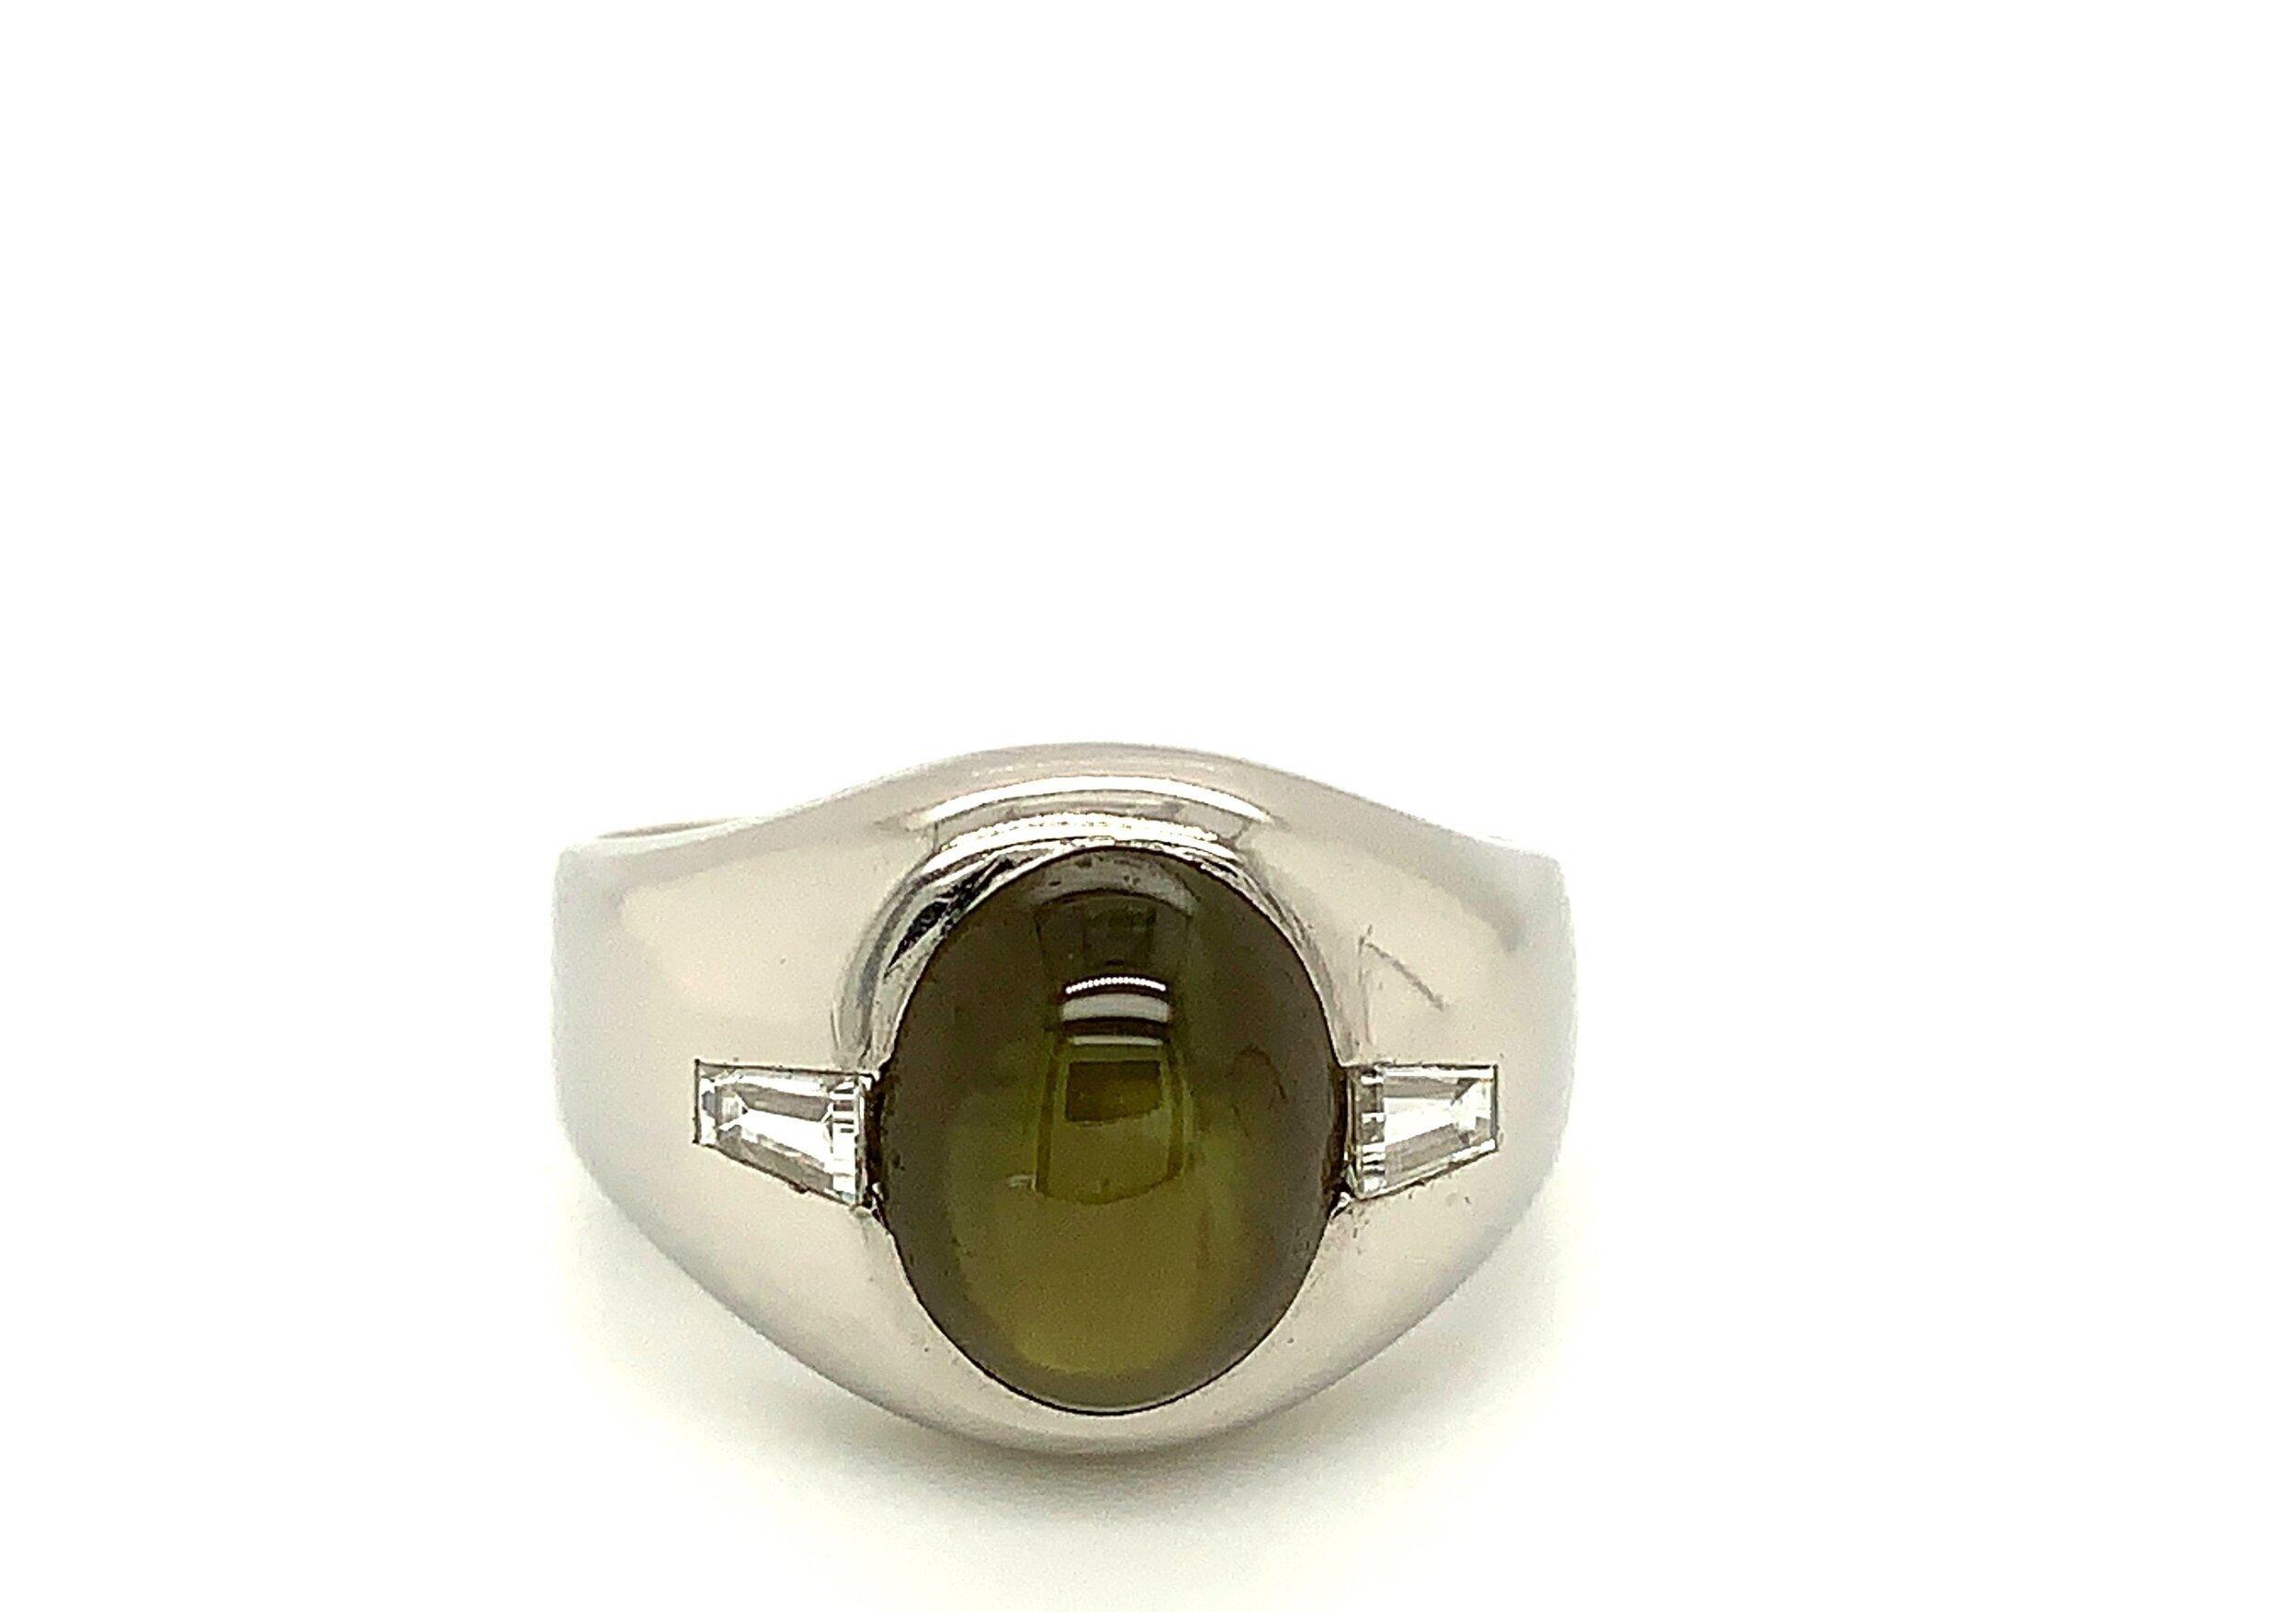 Rare Cat's Eye Chrysoberyl Ring Set in Platinum  Est. US$ 5,000-7,000